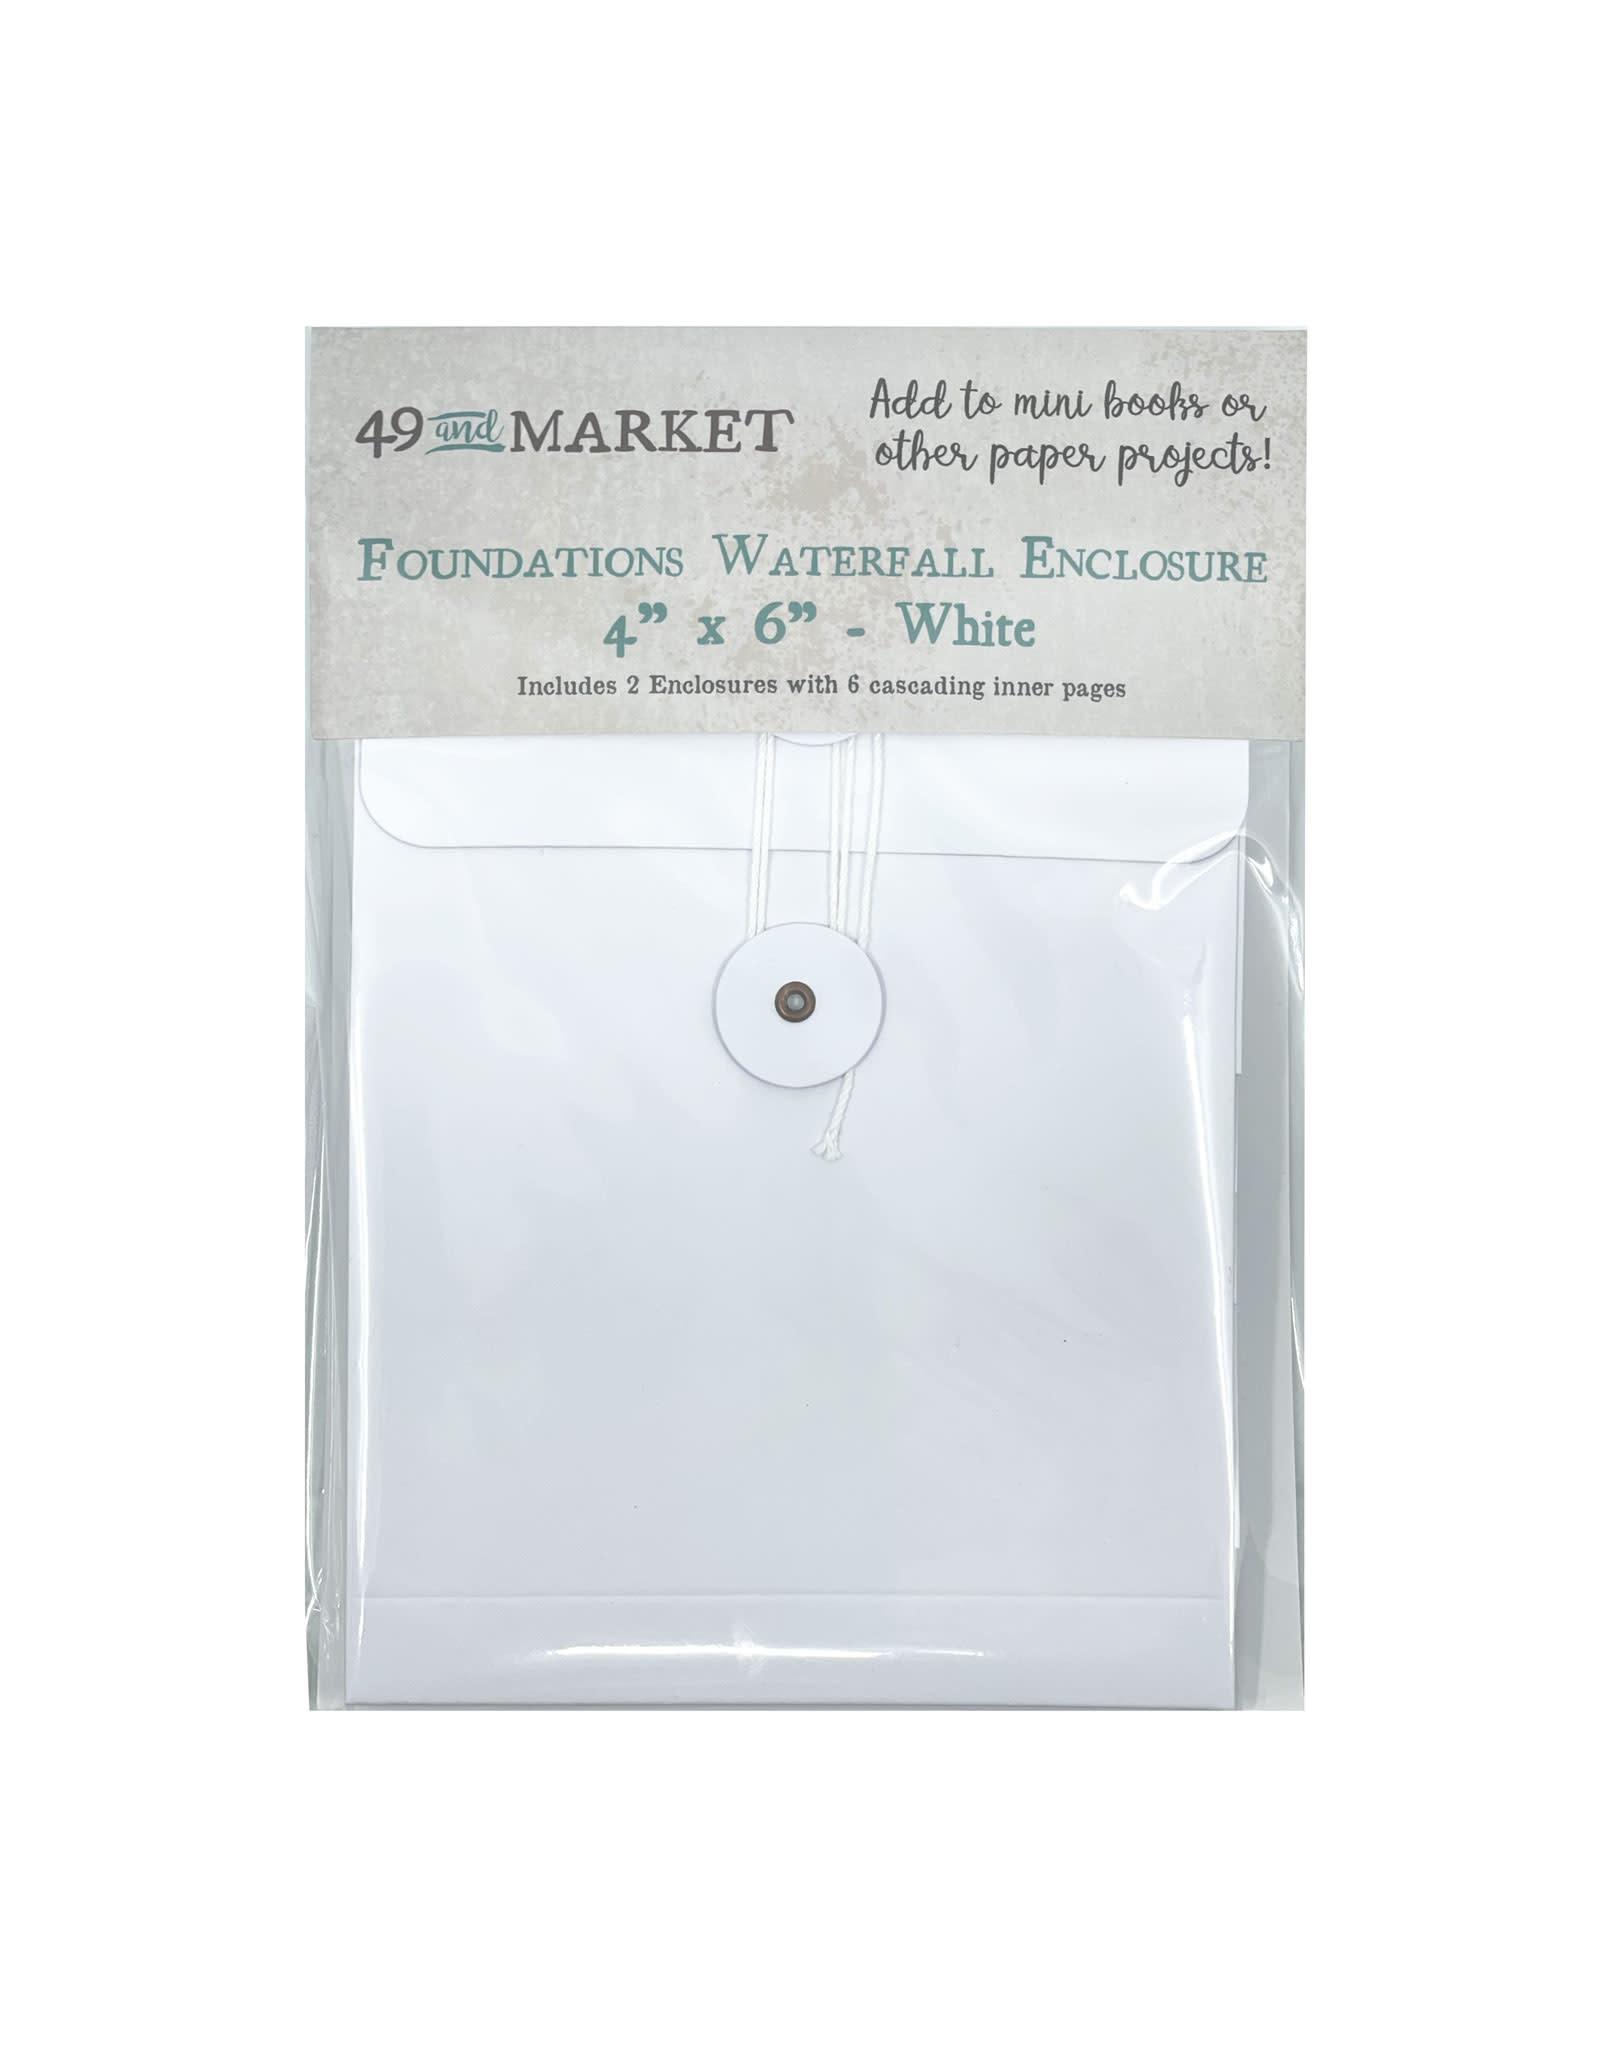 49 AND MARKET Album Waterfall Enclosure 4x6 White